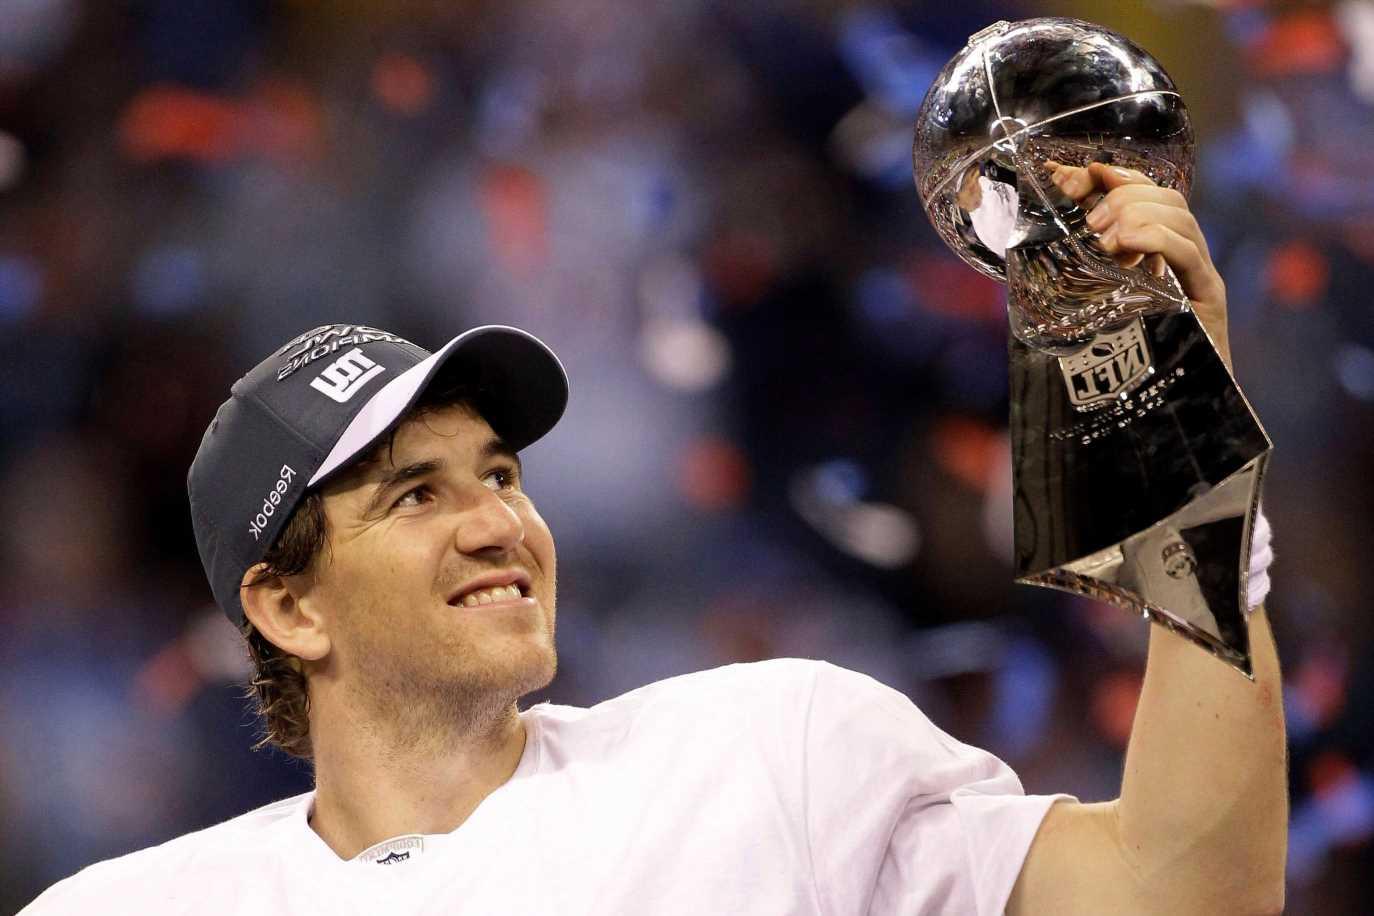 Giants to honor 10th anniversary of Super Bowl XLVI